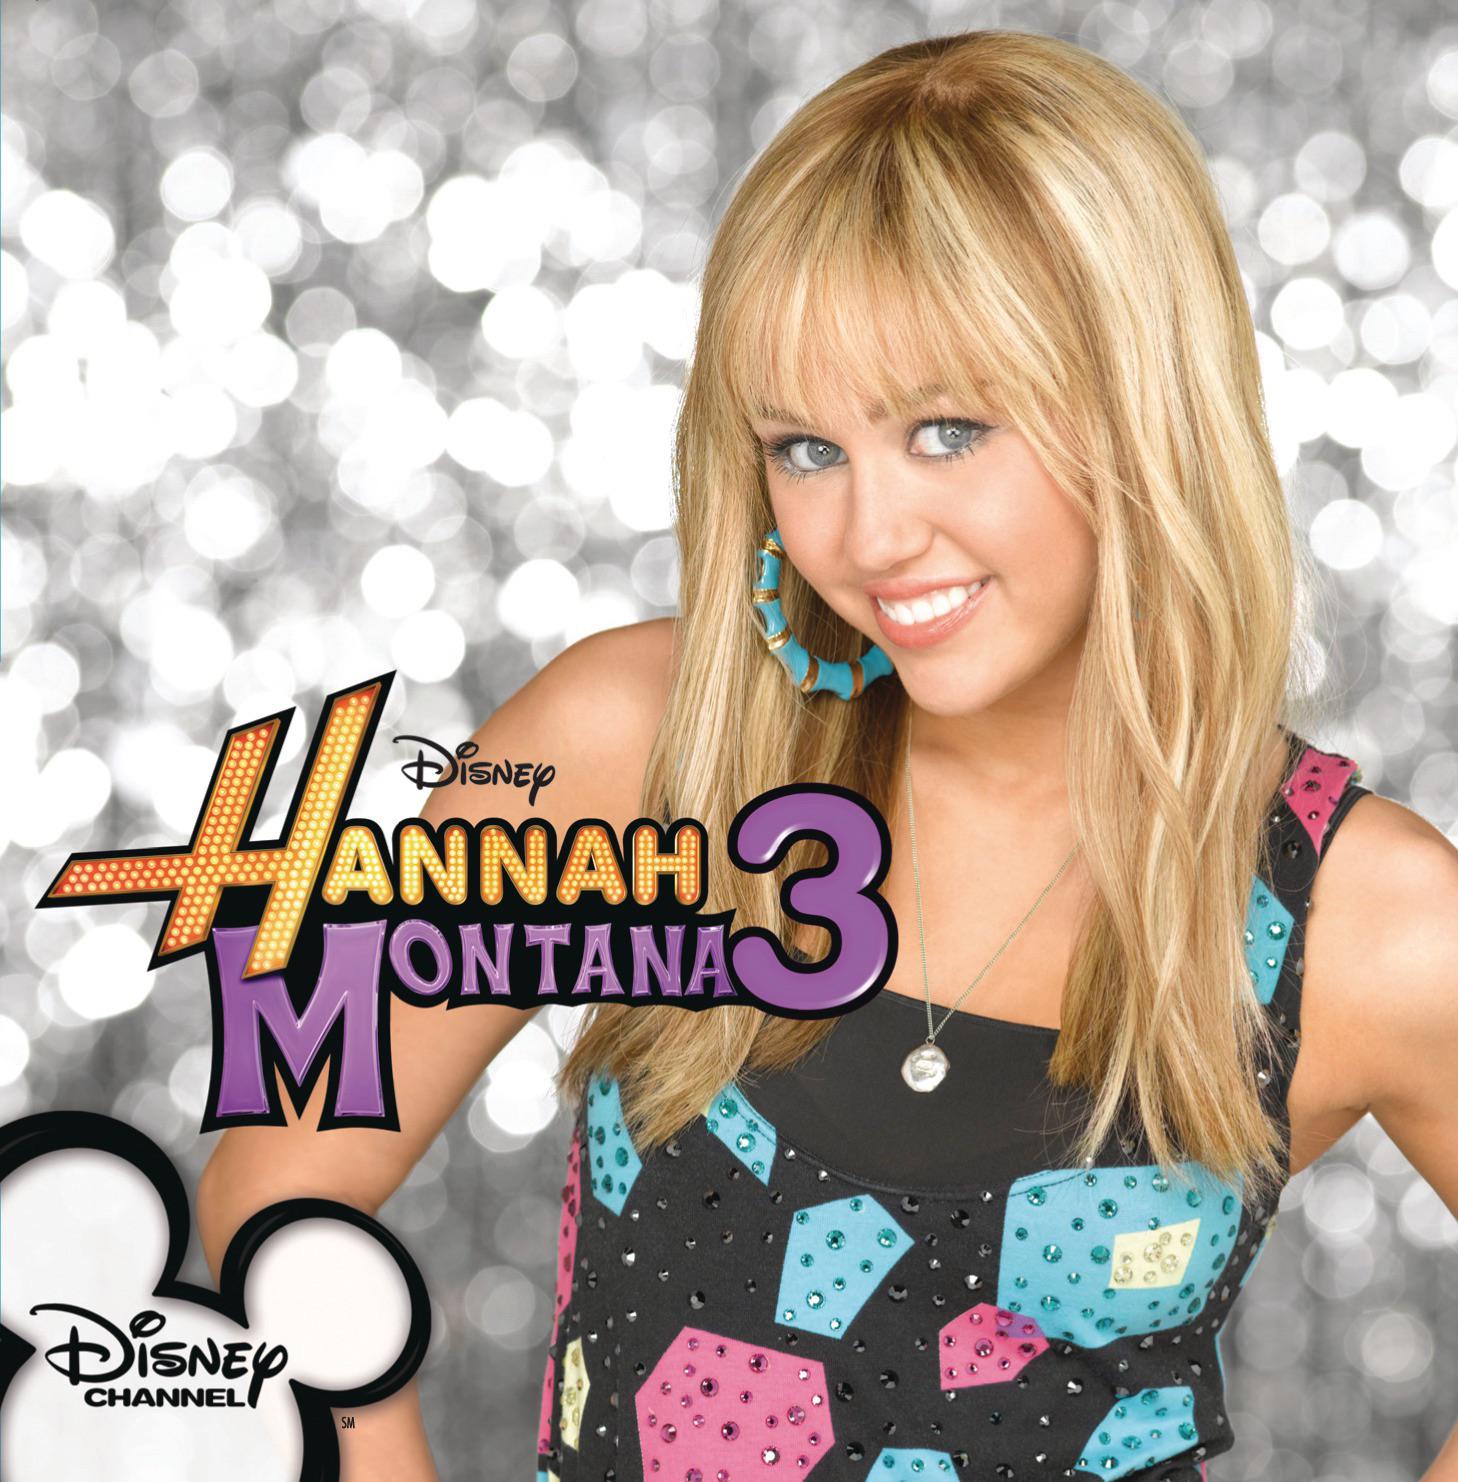 DisneyHM2Soundtrack3